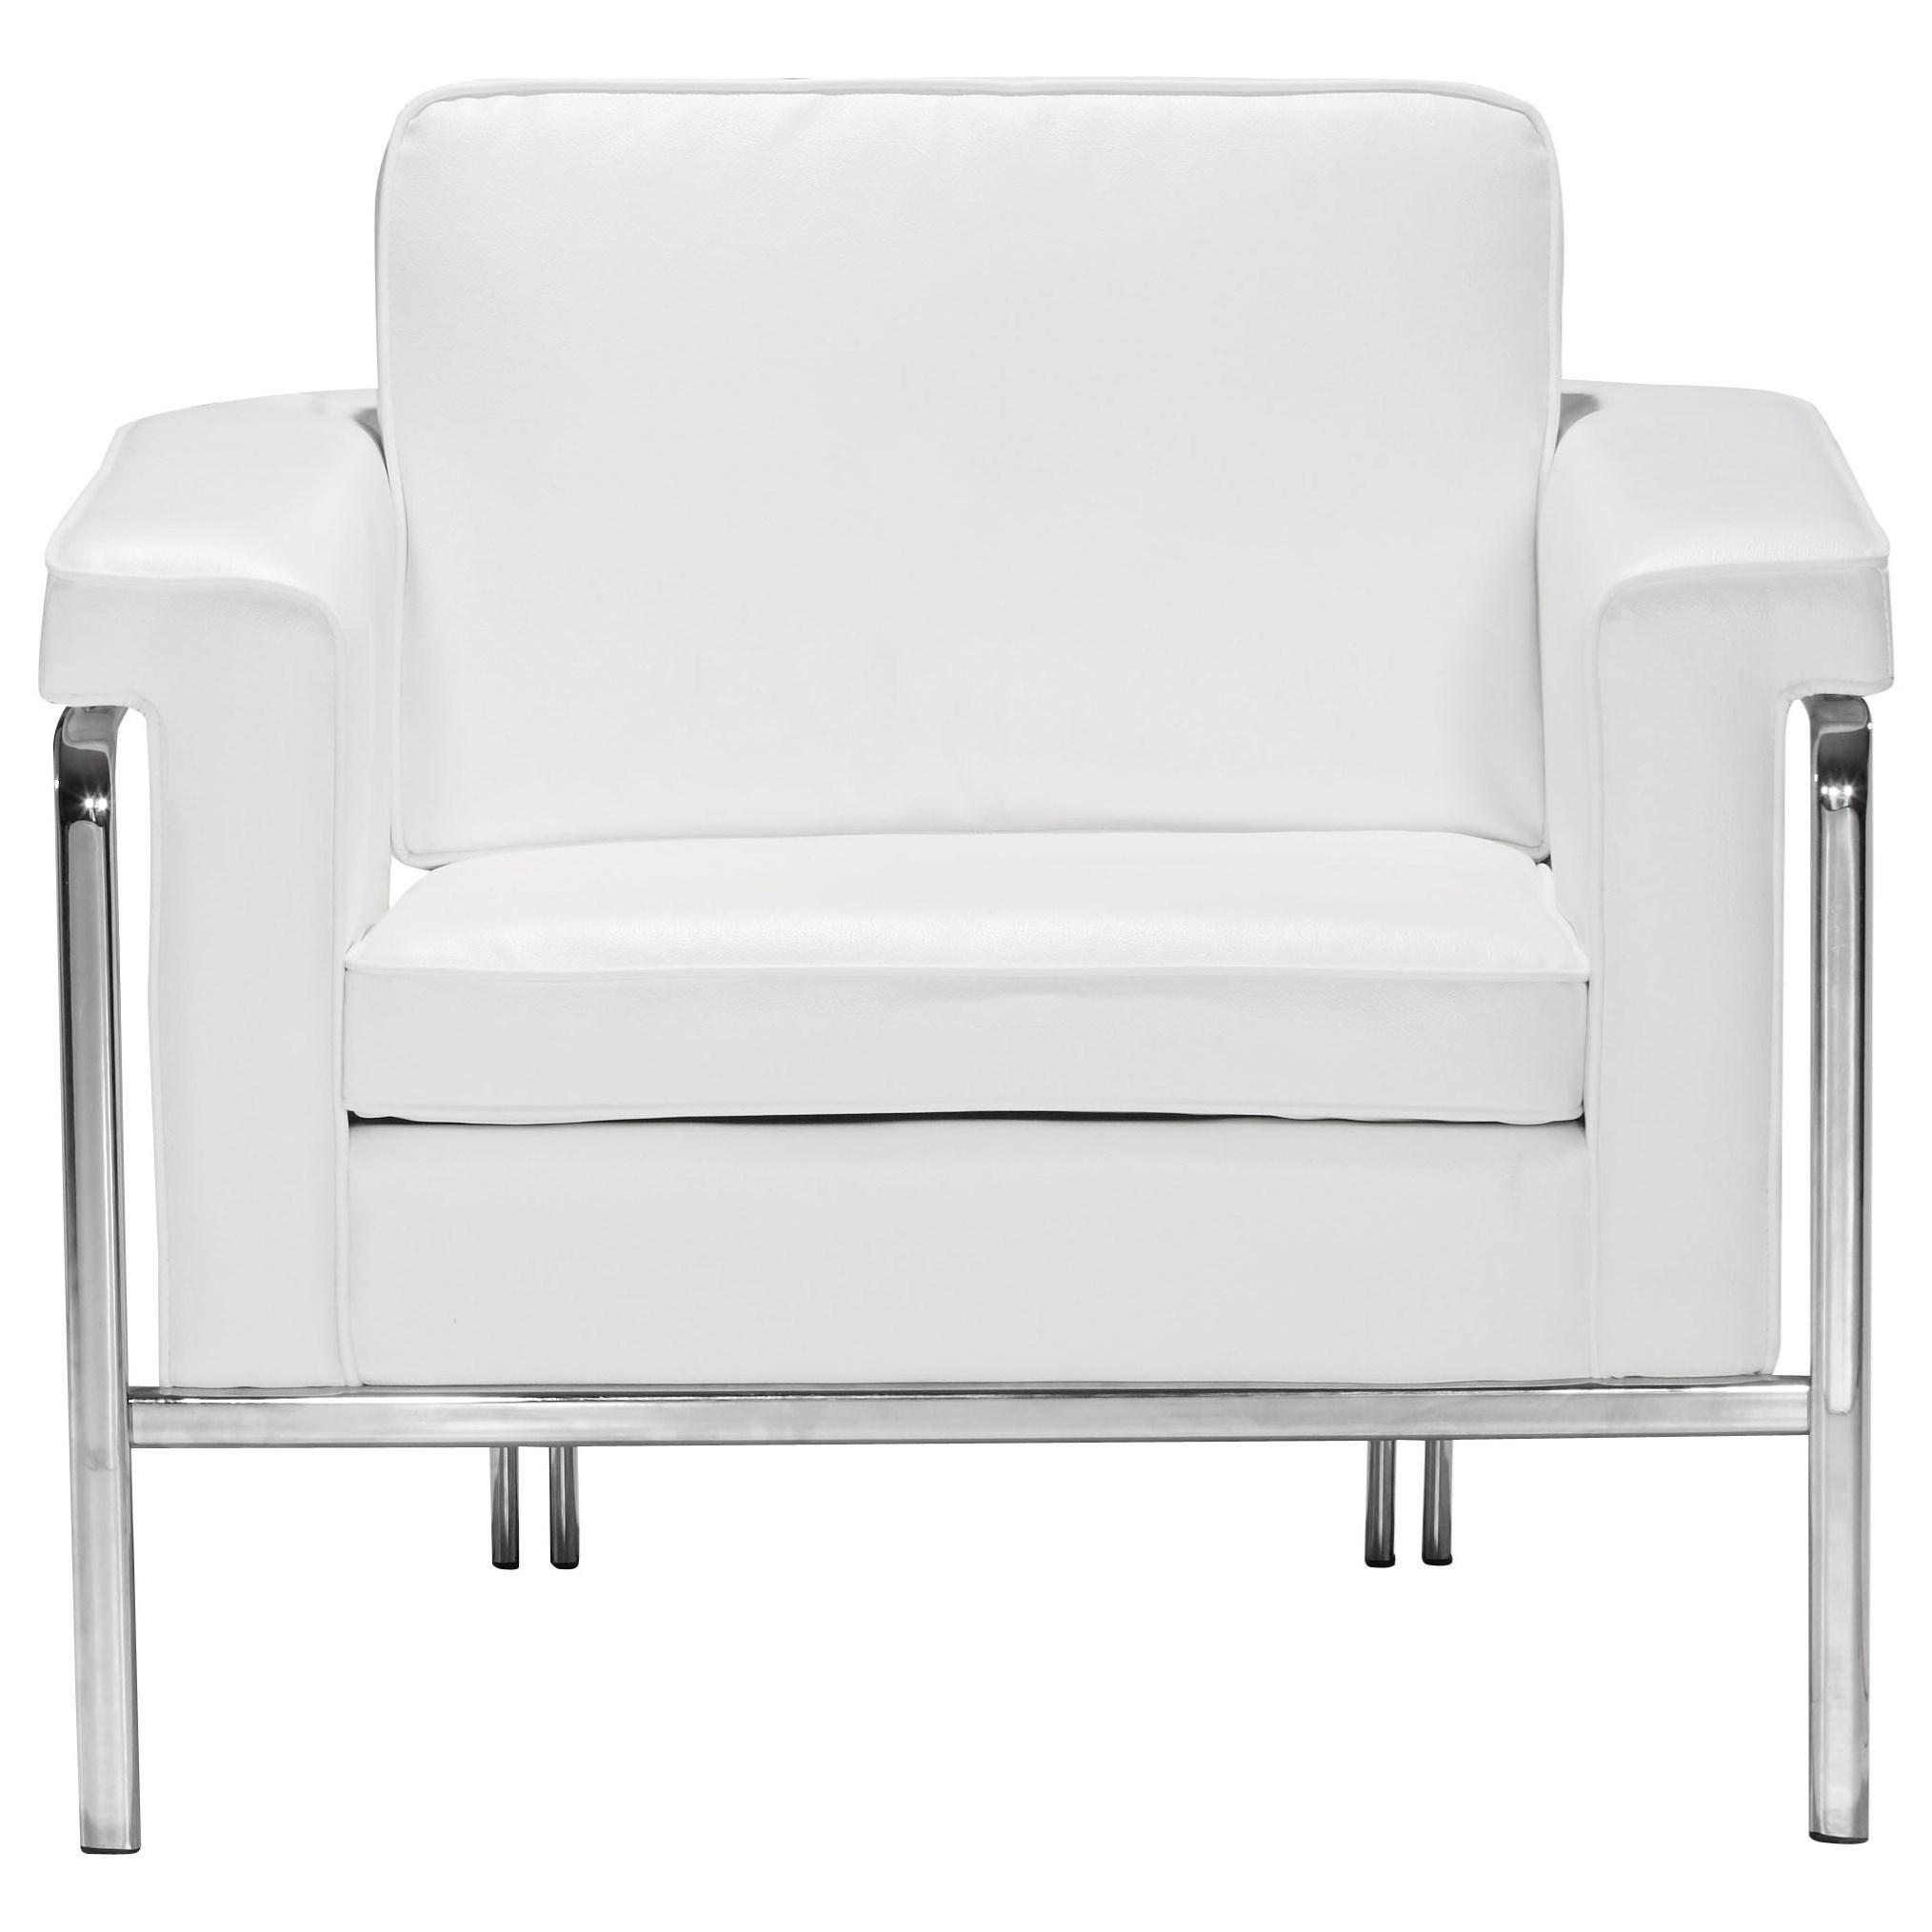 Singular Arm Chair by Zuo at Nassau Furniture and Mattress